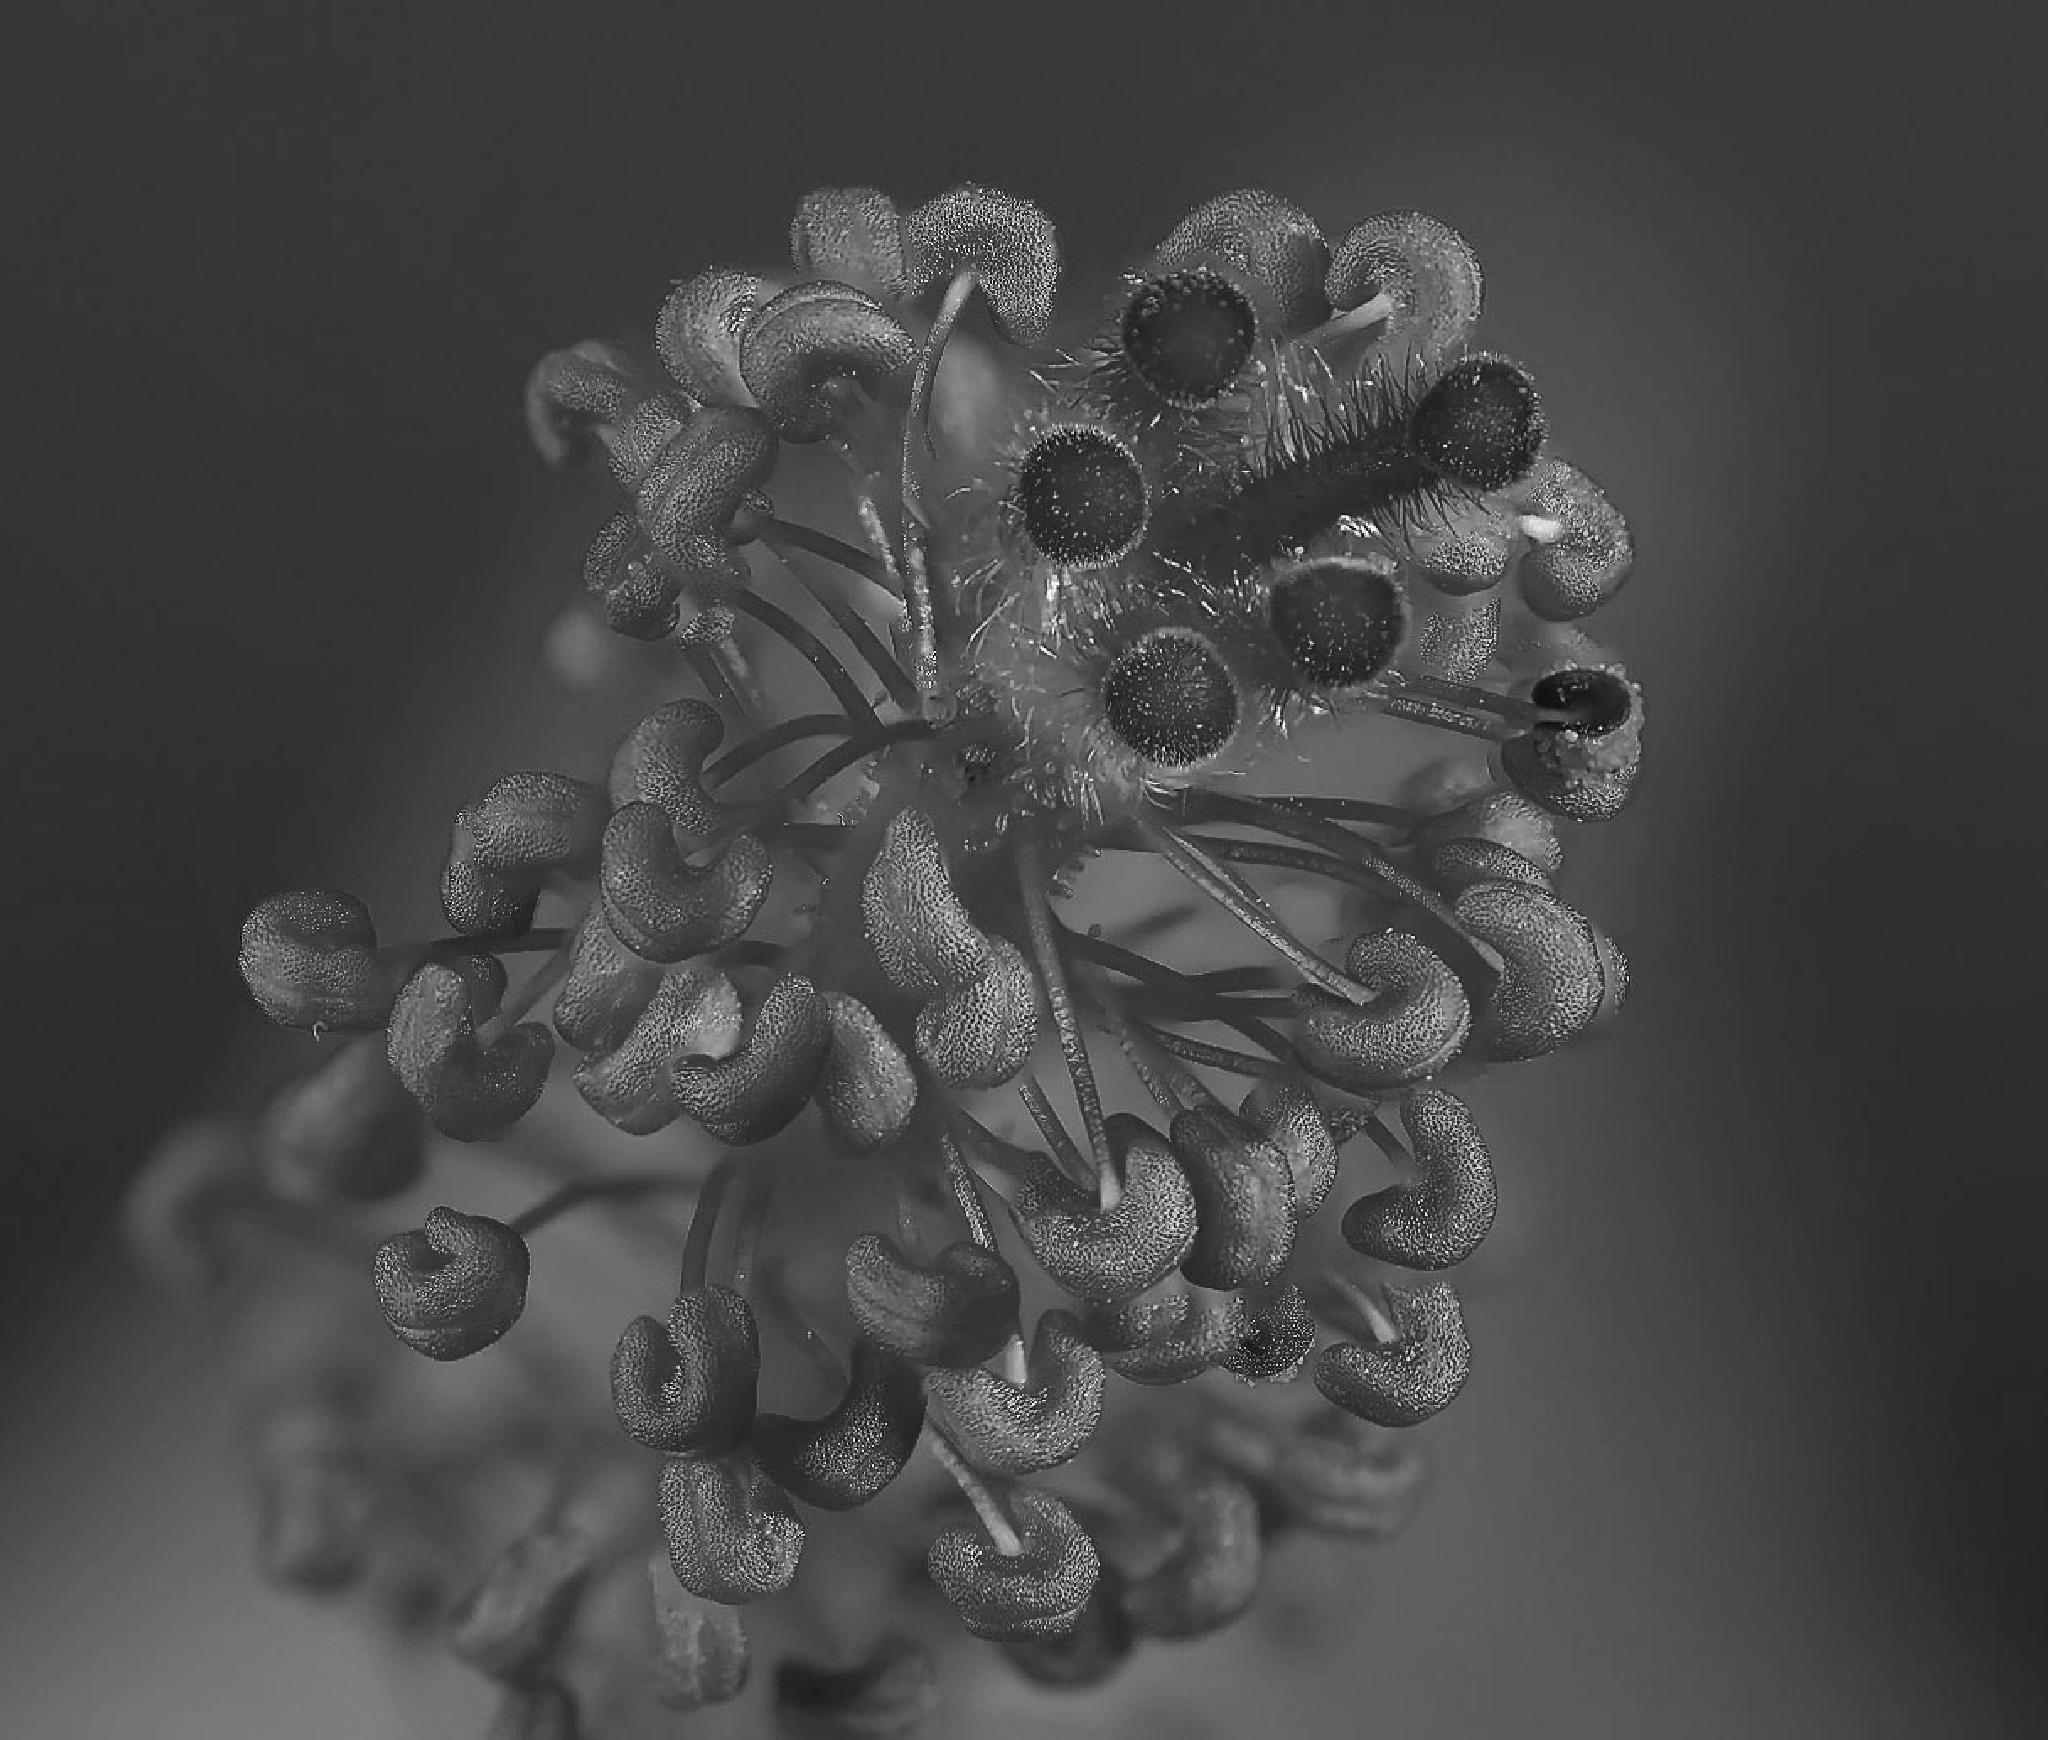 Hibiscus pistil by cristian.negrus